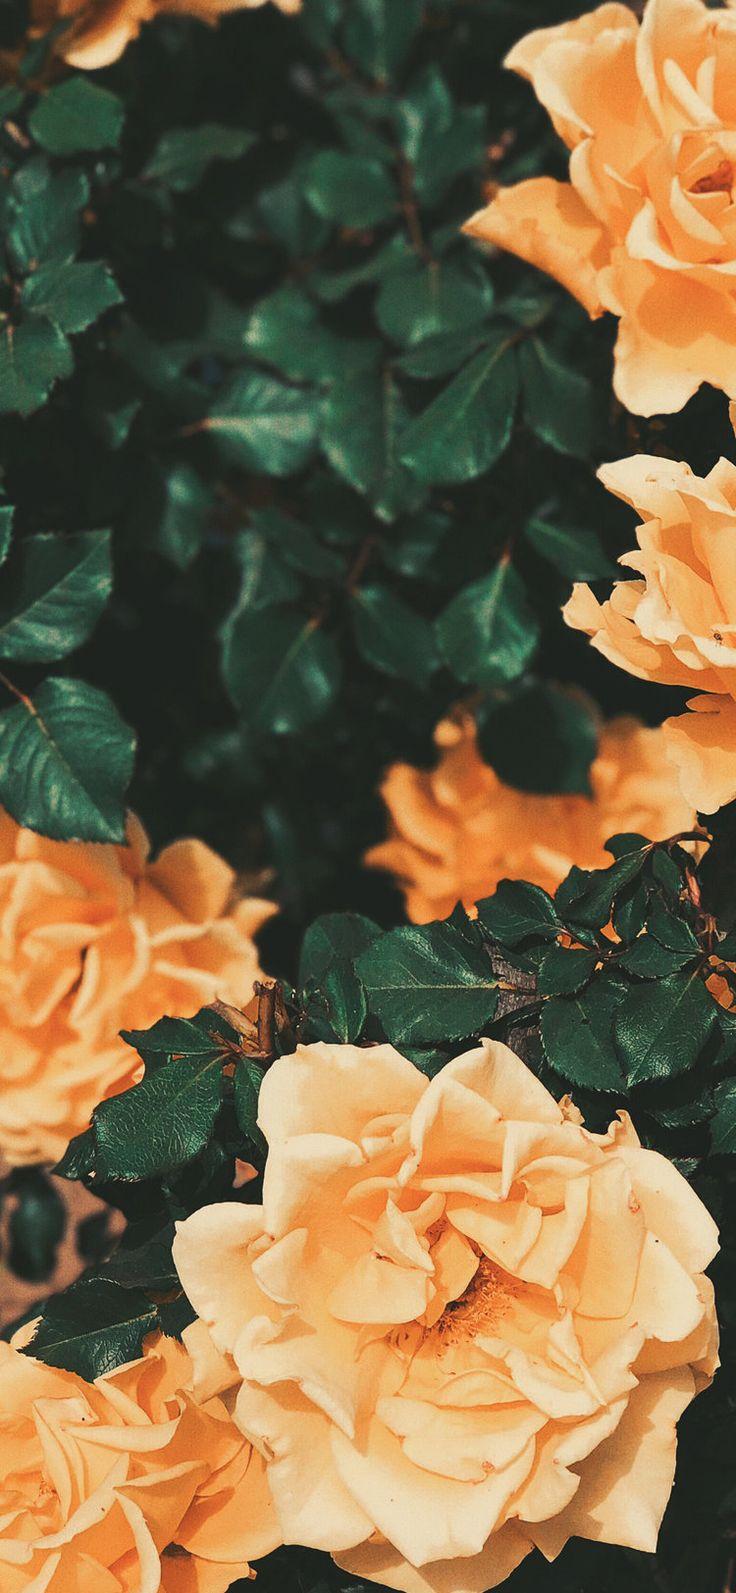 Chris evans pink aesthetic lockscreen •°`. Aesthetic wallpaper | Iphone wallpaper orange, Flower